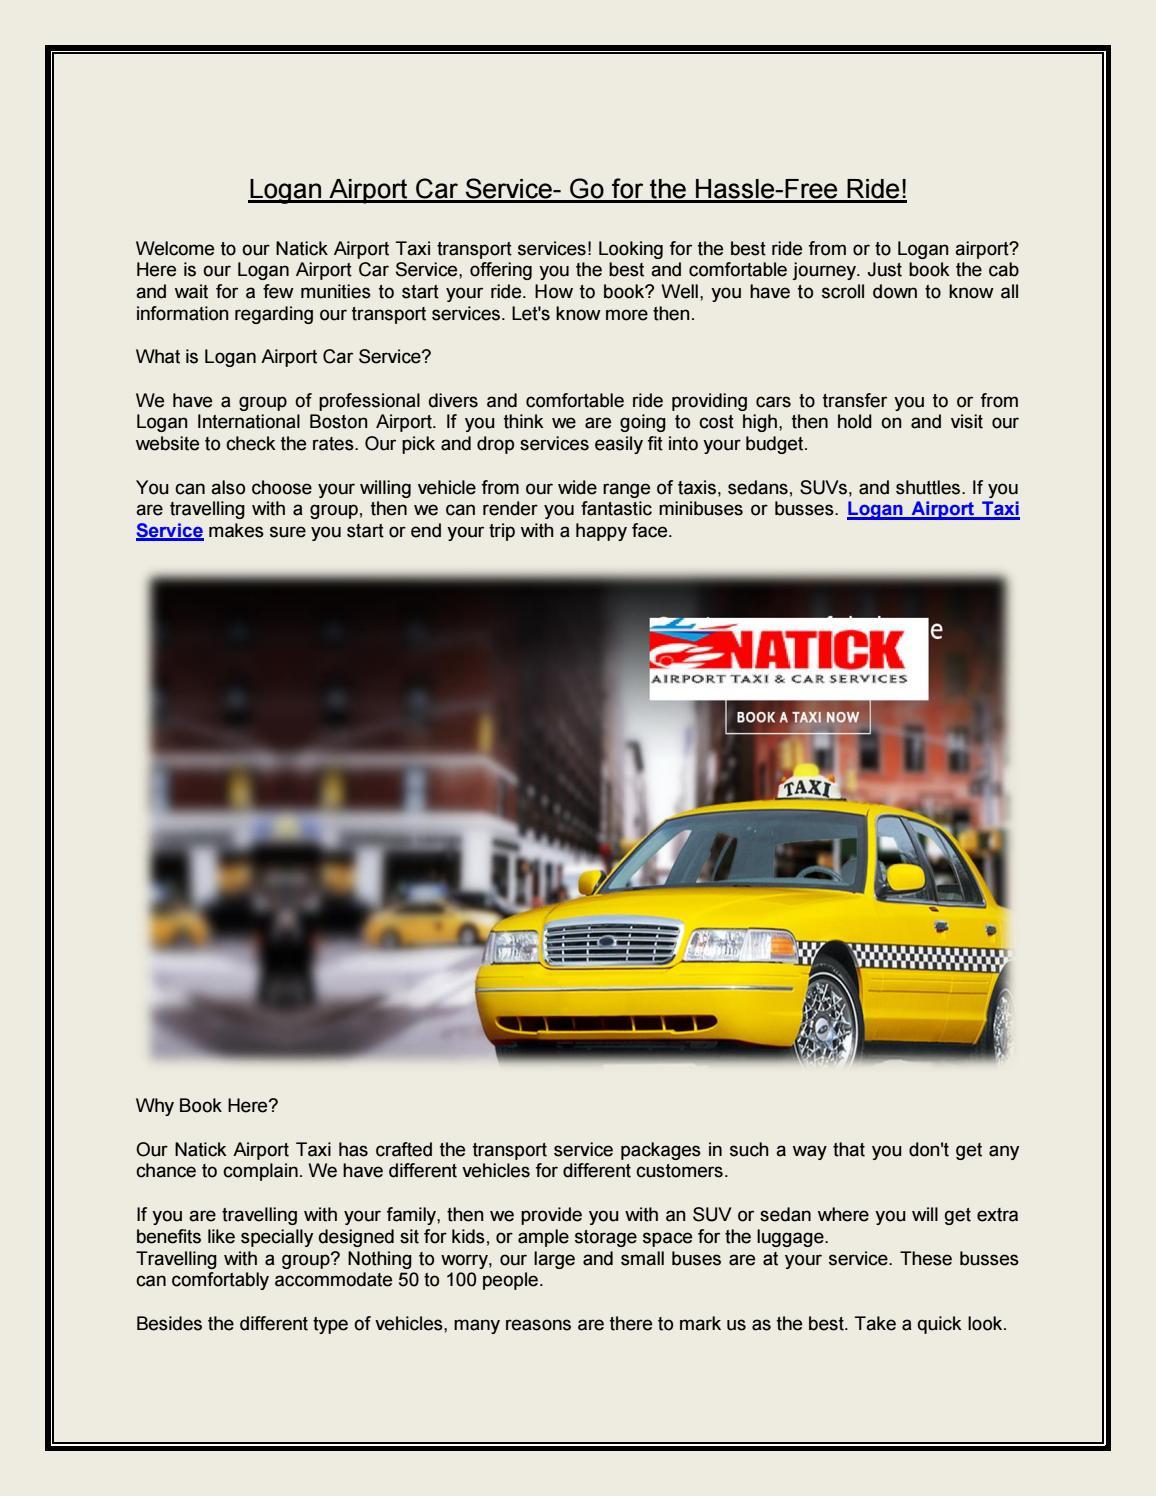 Logan Airport Car Service | Logan Airport Taxi Service